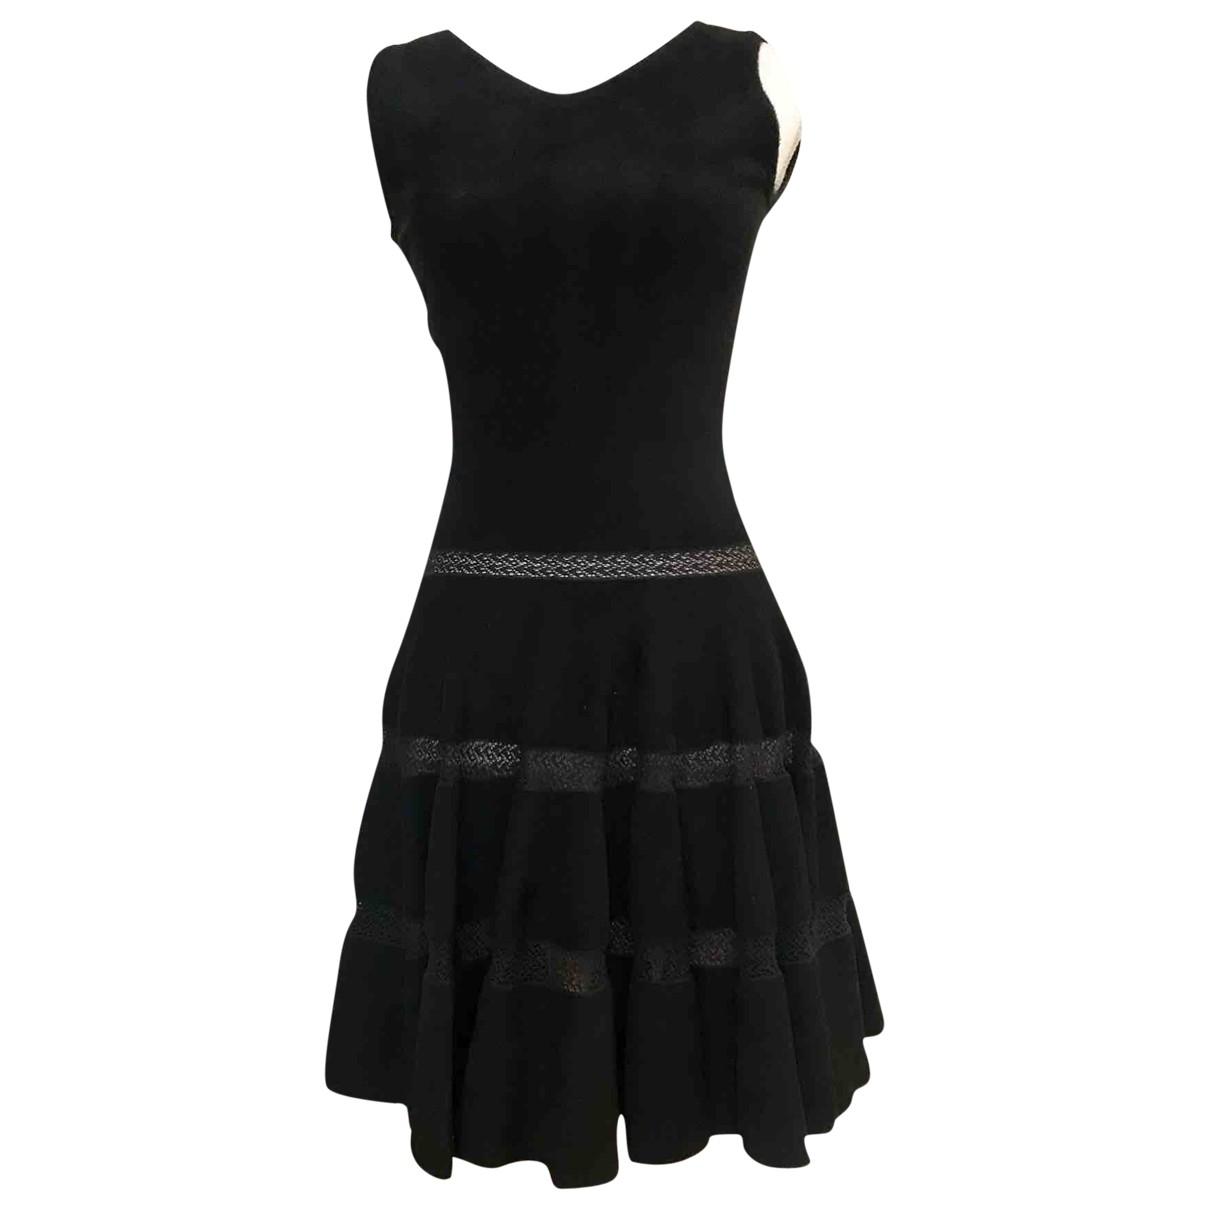 Alaïa \N Black dress for Women 40 FR